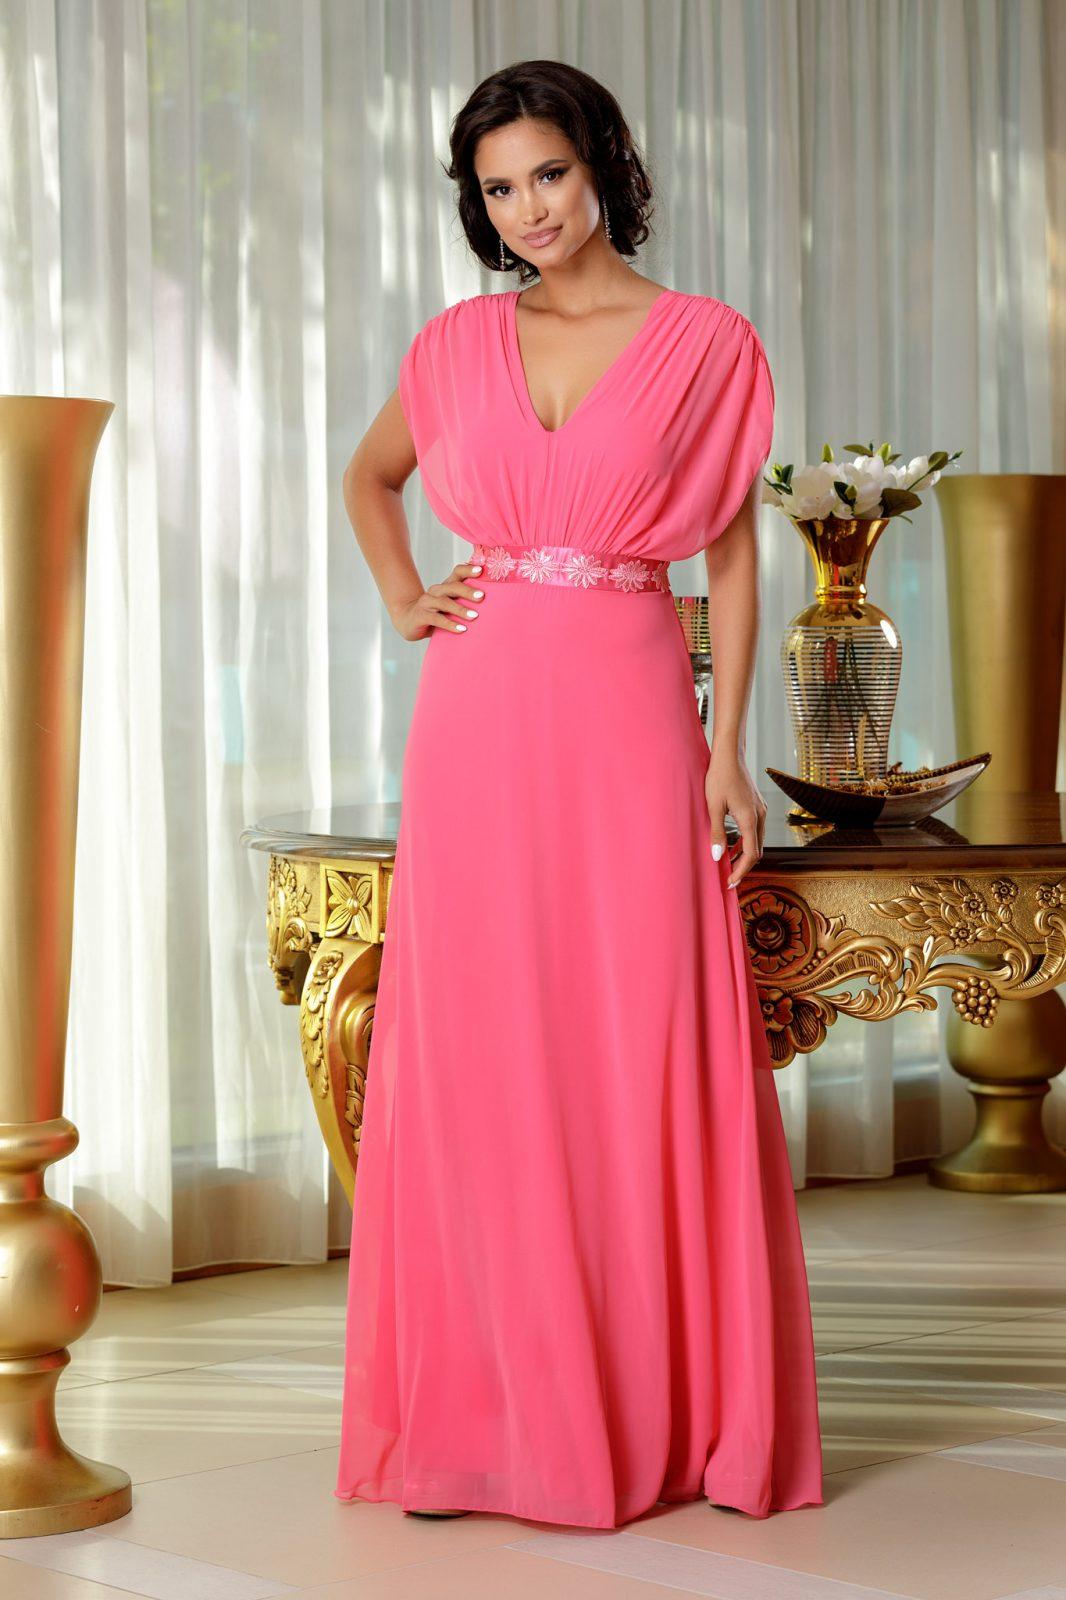 Madeyra Φούξια Φόρεμα 4721